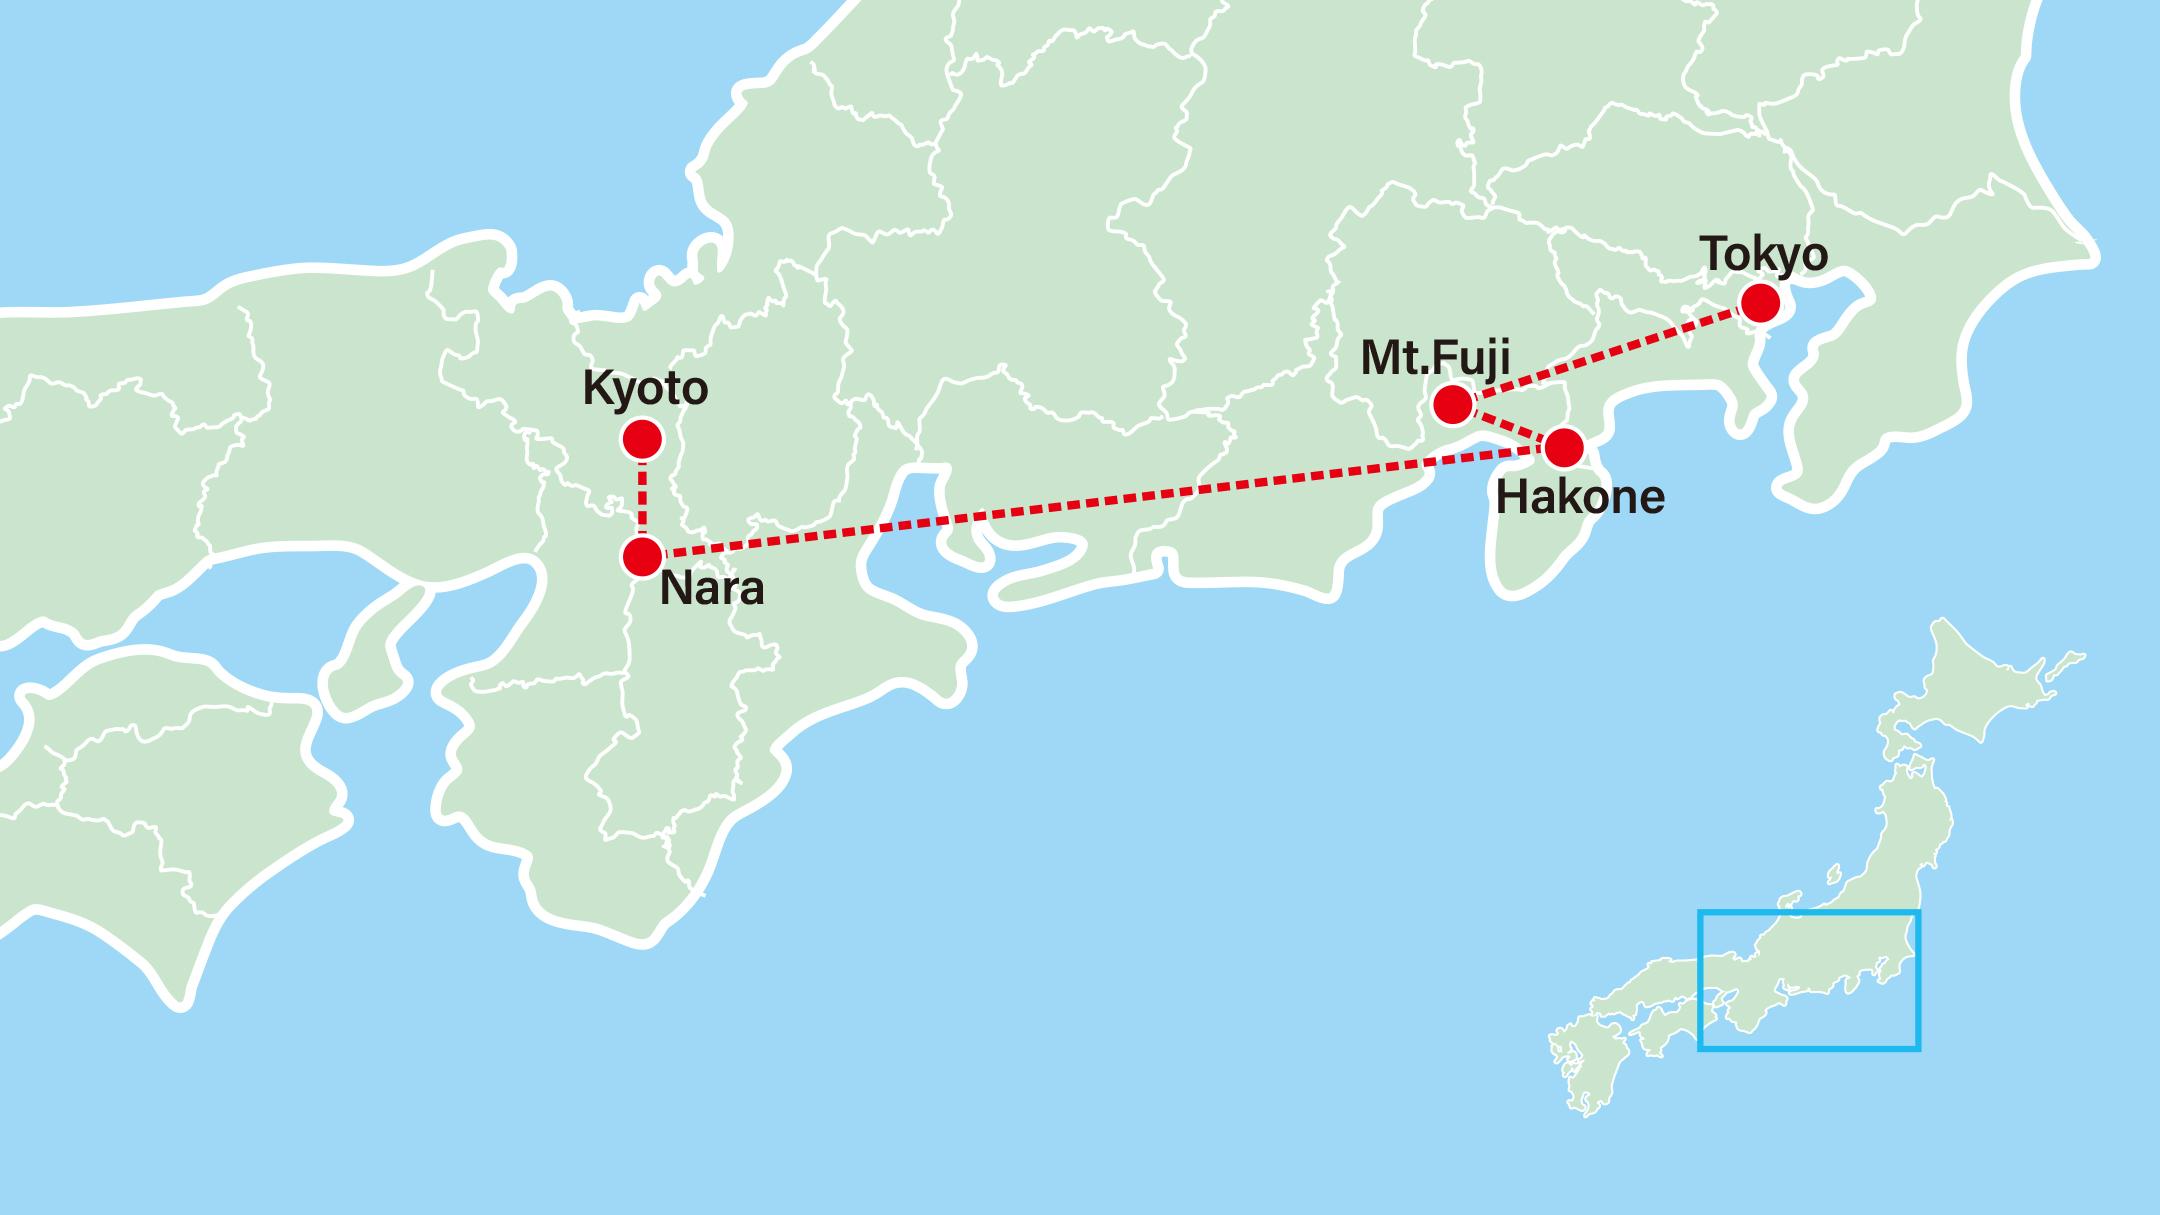 Anime Japan EXPO 2022 9 Days -Kyoto-Nara-Mt. Fuji-Hakone-Tokyo